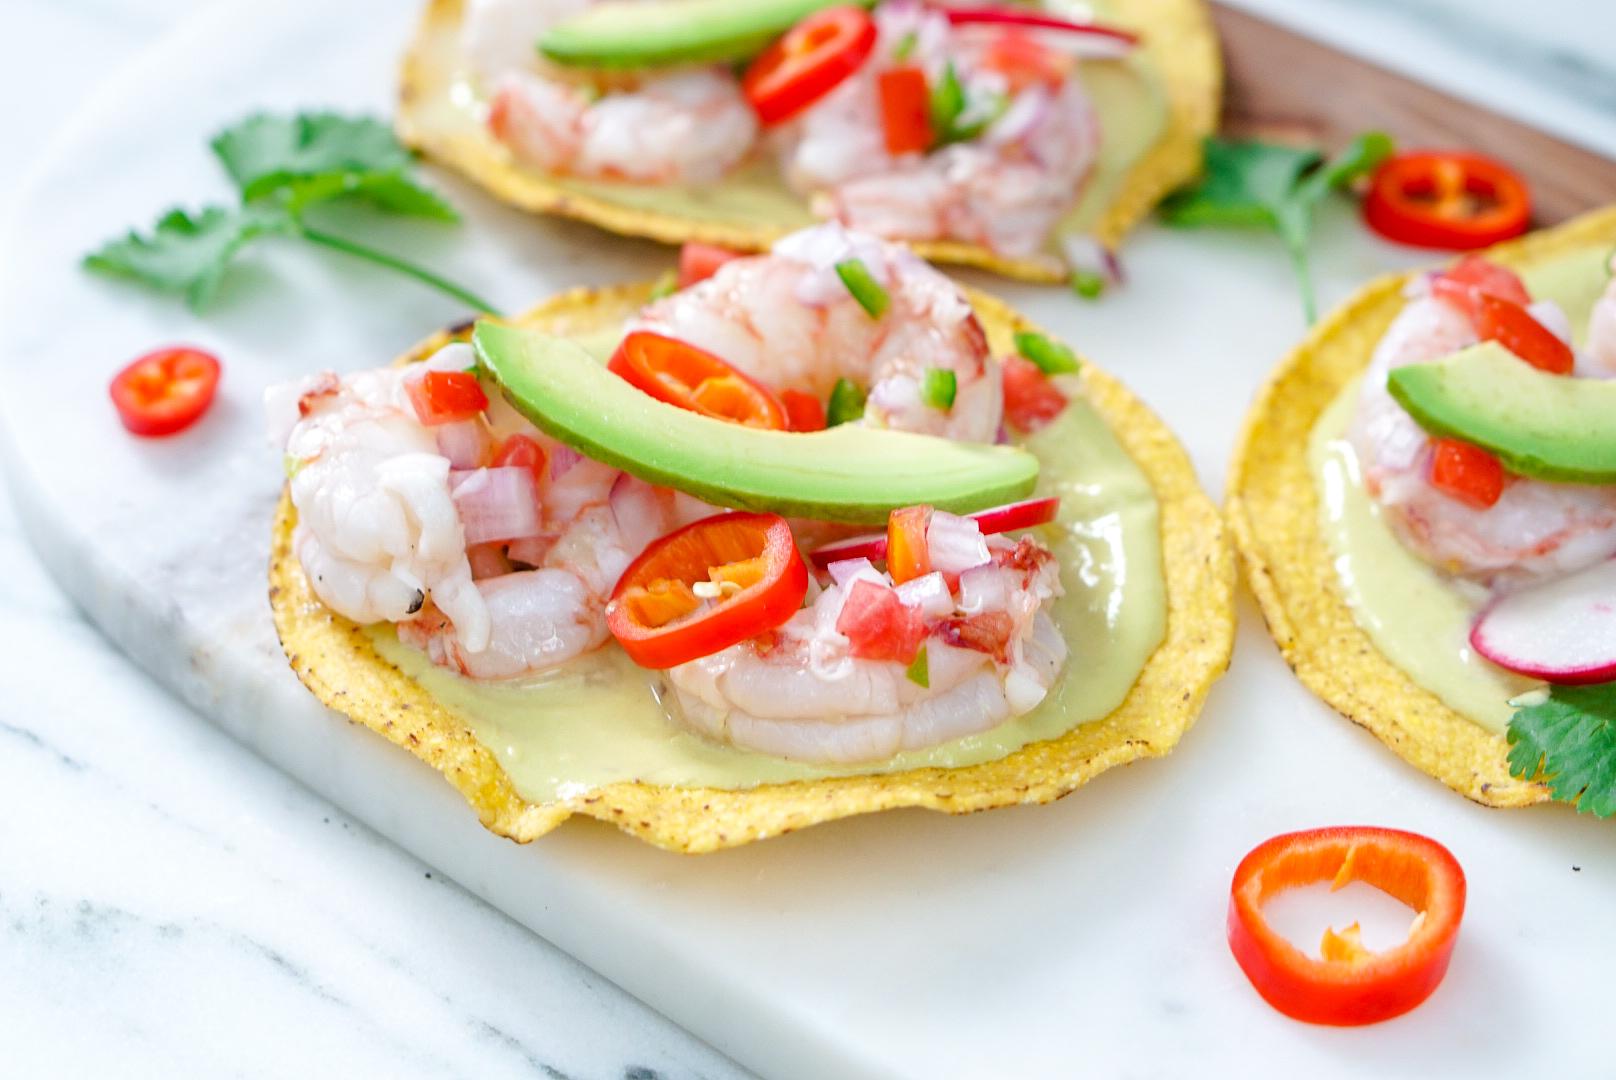 Shrimp Ceviche Tostadas | Gluten Free, Low Cal, No Cook Recipe | coupleinthekitchen.com